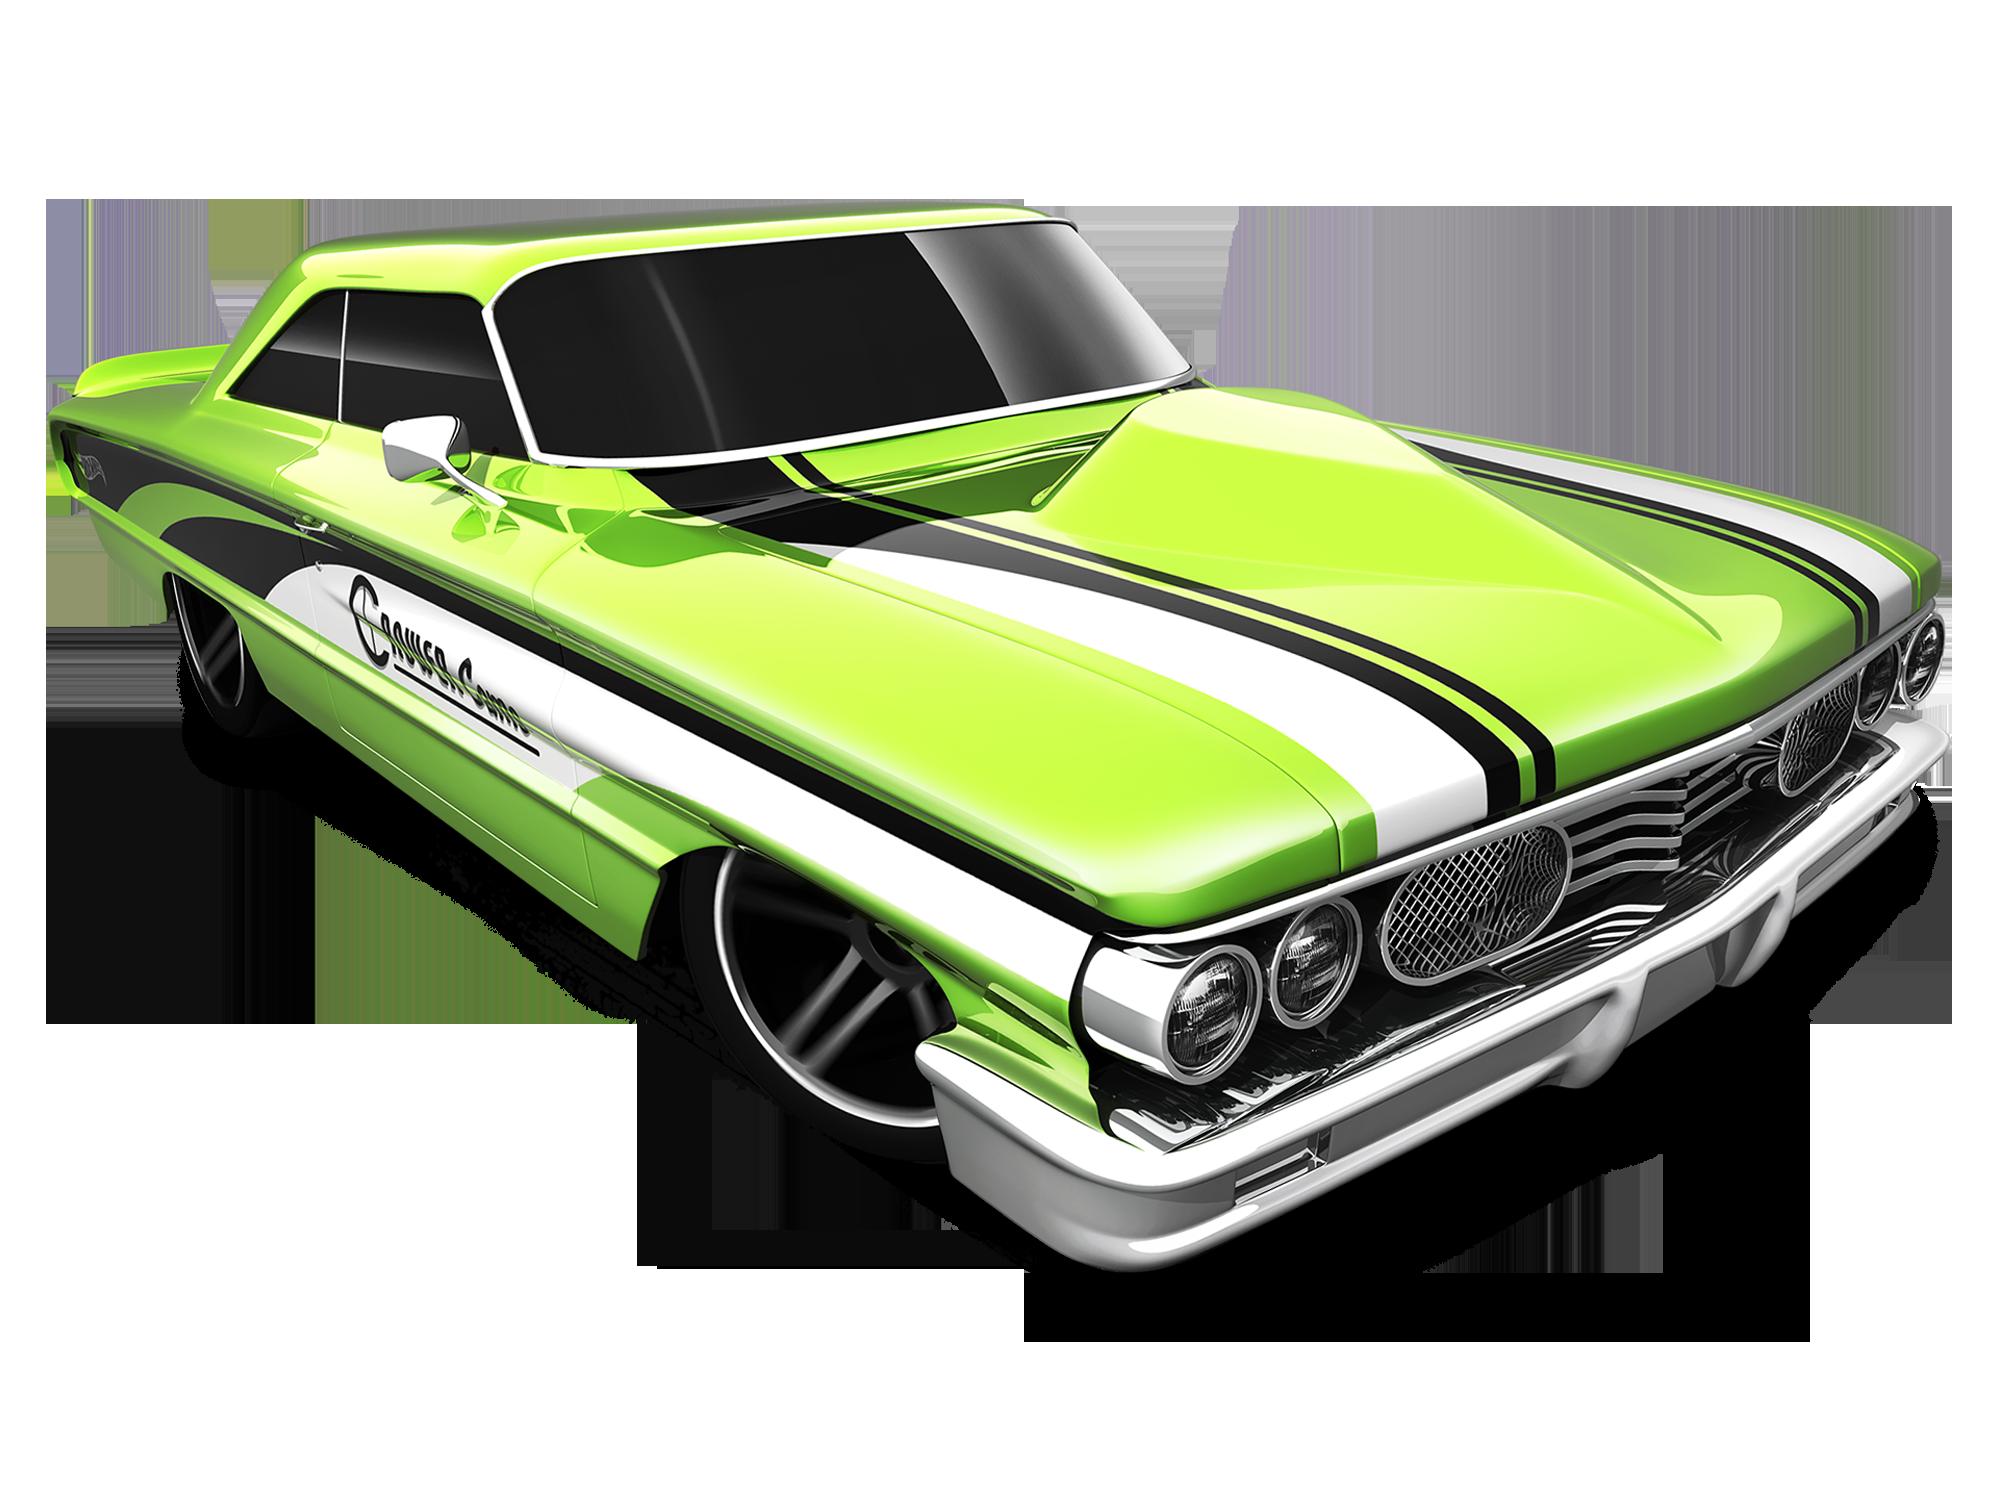 Mattel Hot Wheels Diecast Car Custom 64 Galaxie 500 2014 Green Carros E Motos Super Carro Carros